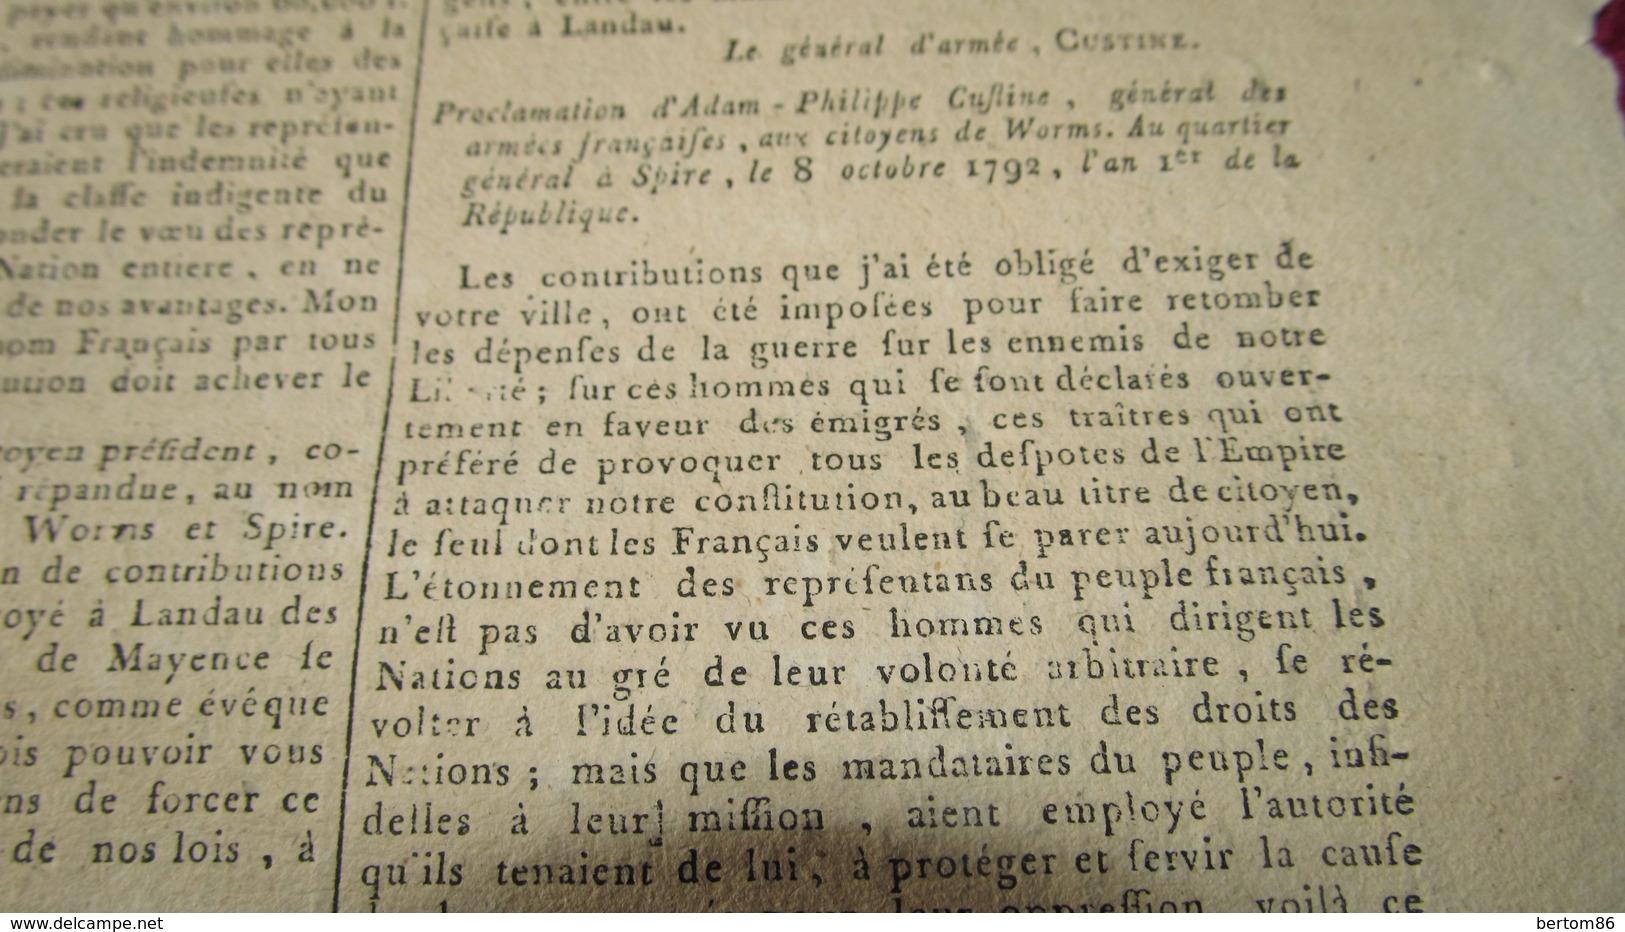 ADAM-PHILIPPE DE CUSTINE AU QUARTIER GENERAL DE SPIRE / SPEYER - LETTRES / PROCLAMATION - OCTOBRE 1792. - Newspapers